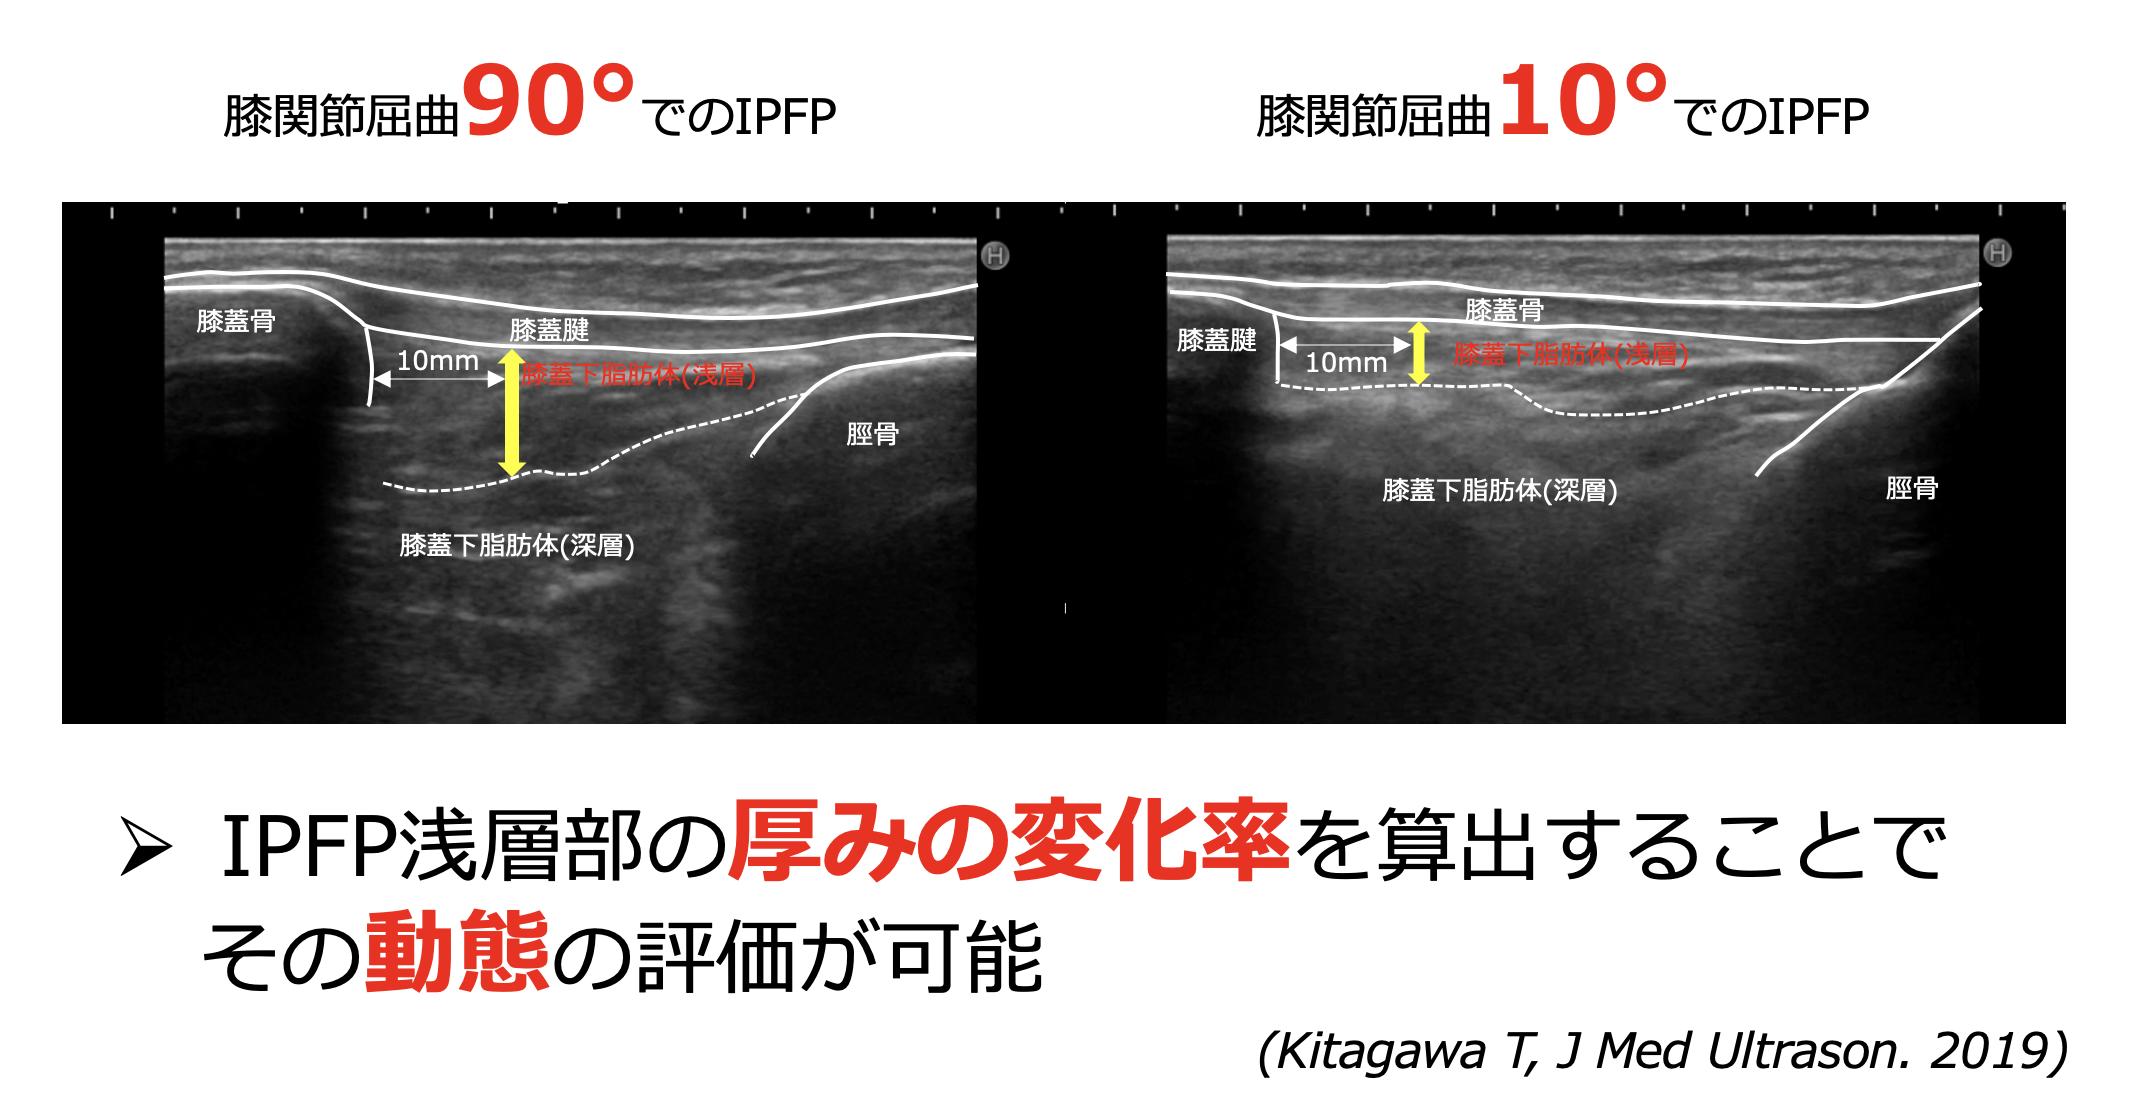 IPFP-3